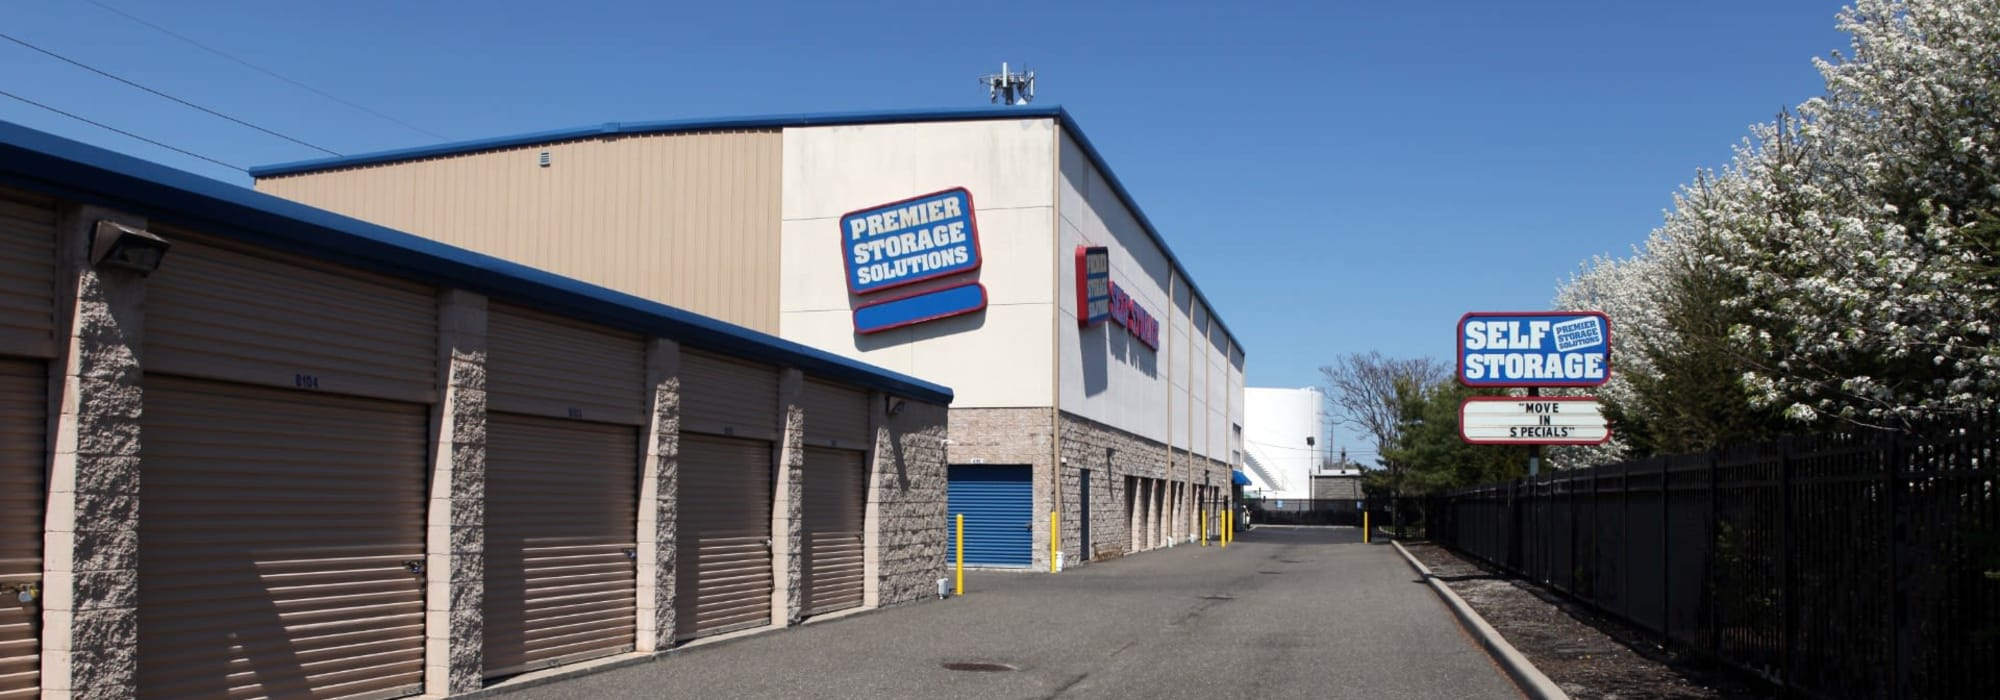 Premier Storage Solutions of West Islip self storage in West Islip, New York